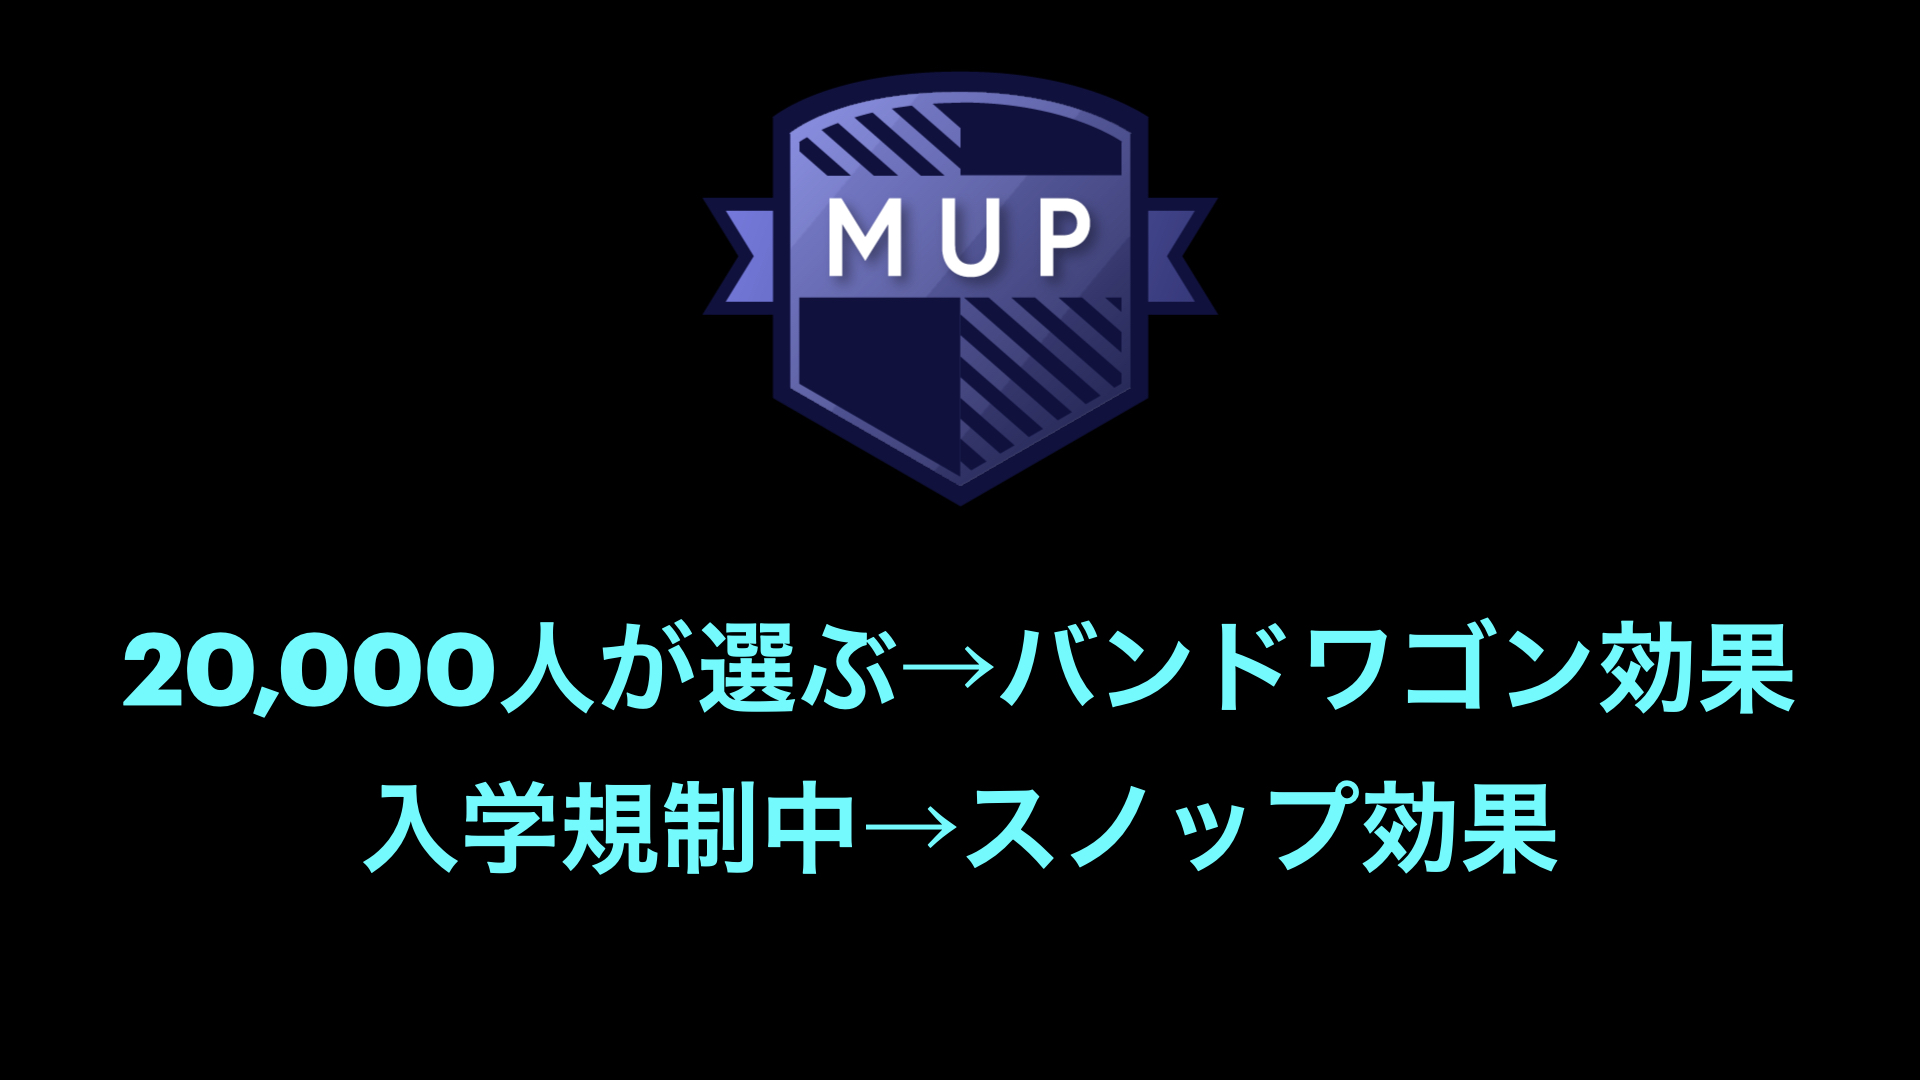 MUPのPR